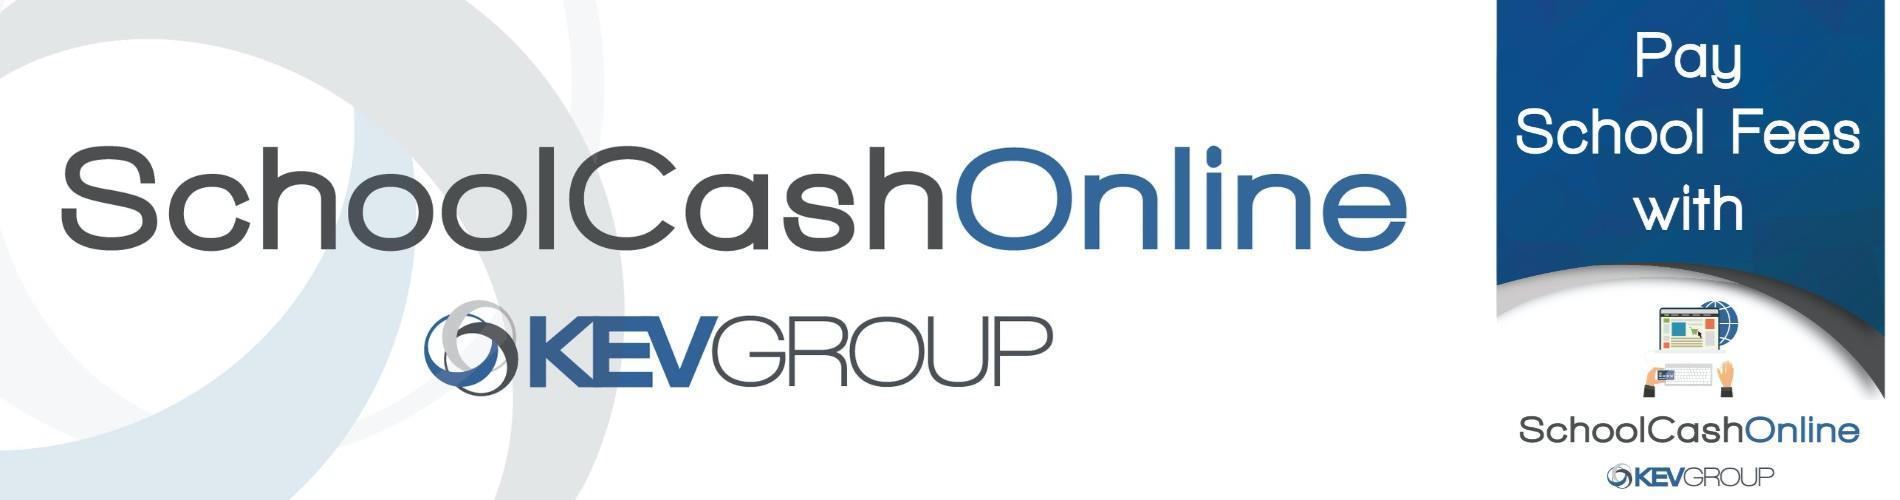 Cash Online Banner